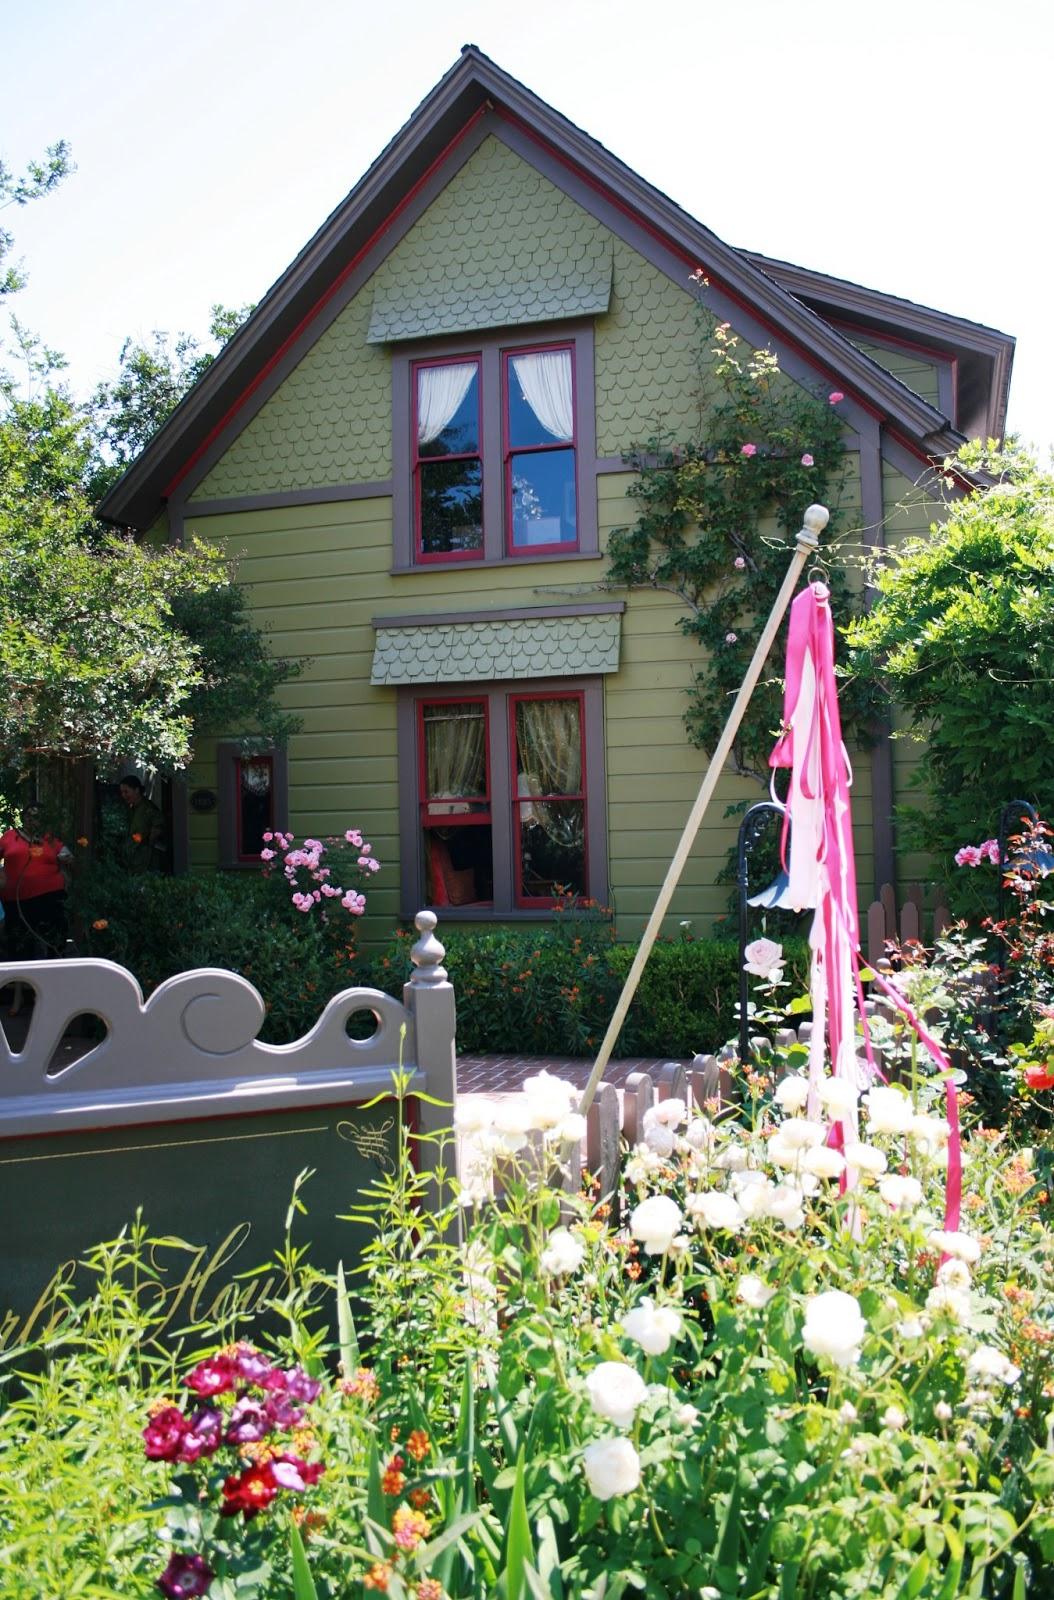 Ciao Newport Beach The Old Town Tustin Home Garden Tour